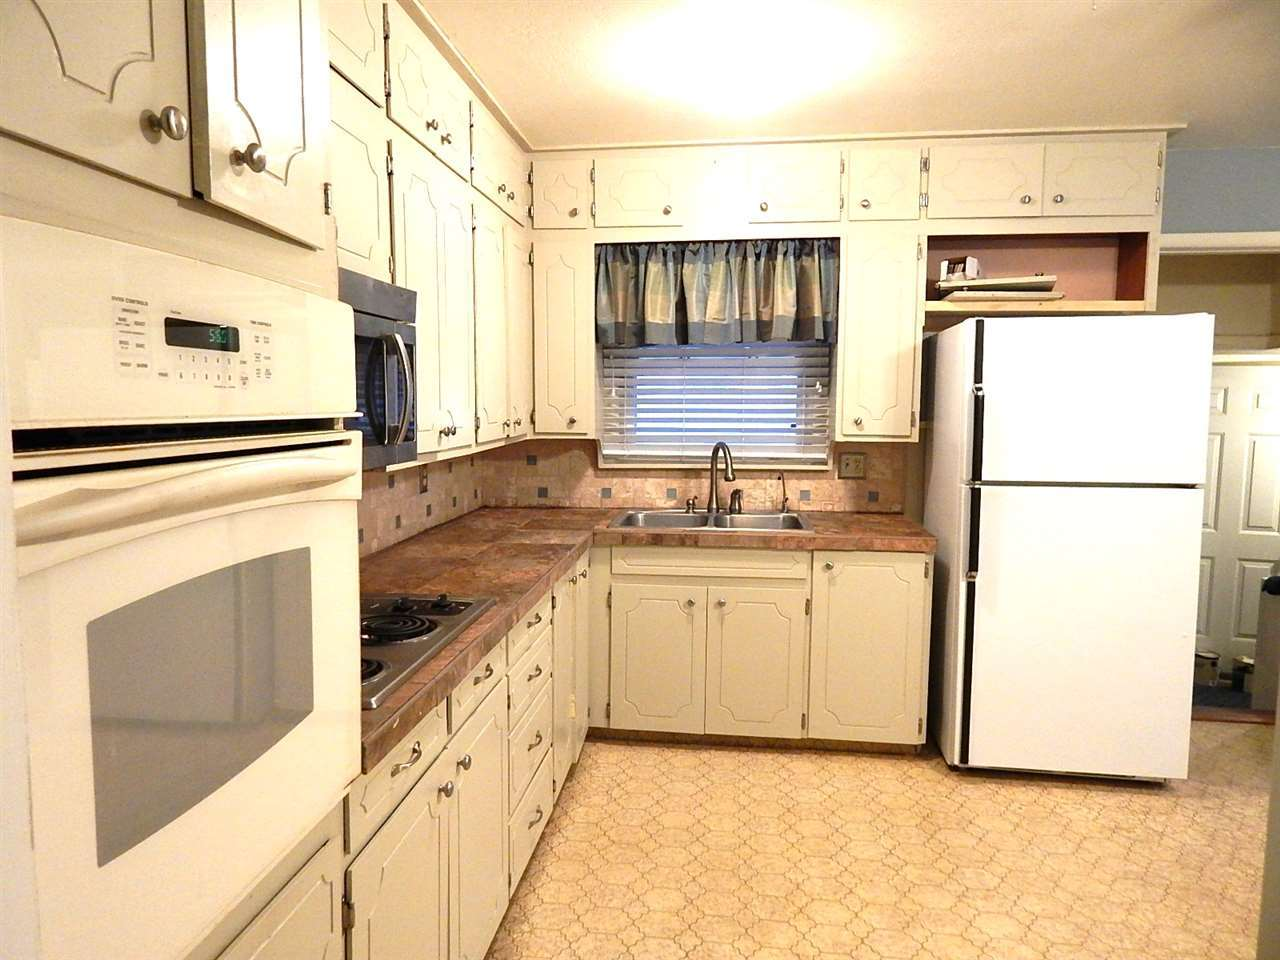 Sold Intraoffice W/MLS | 2226 Garden Ponca City, OK 74601 3